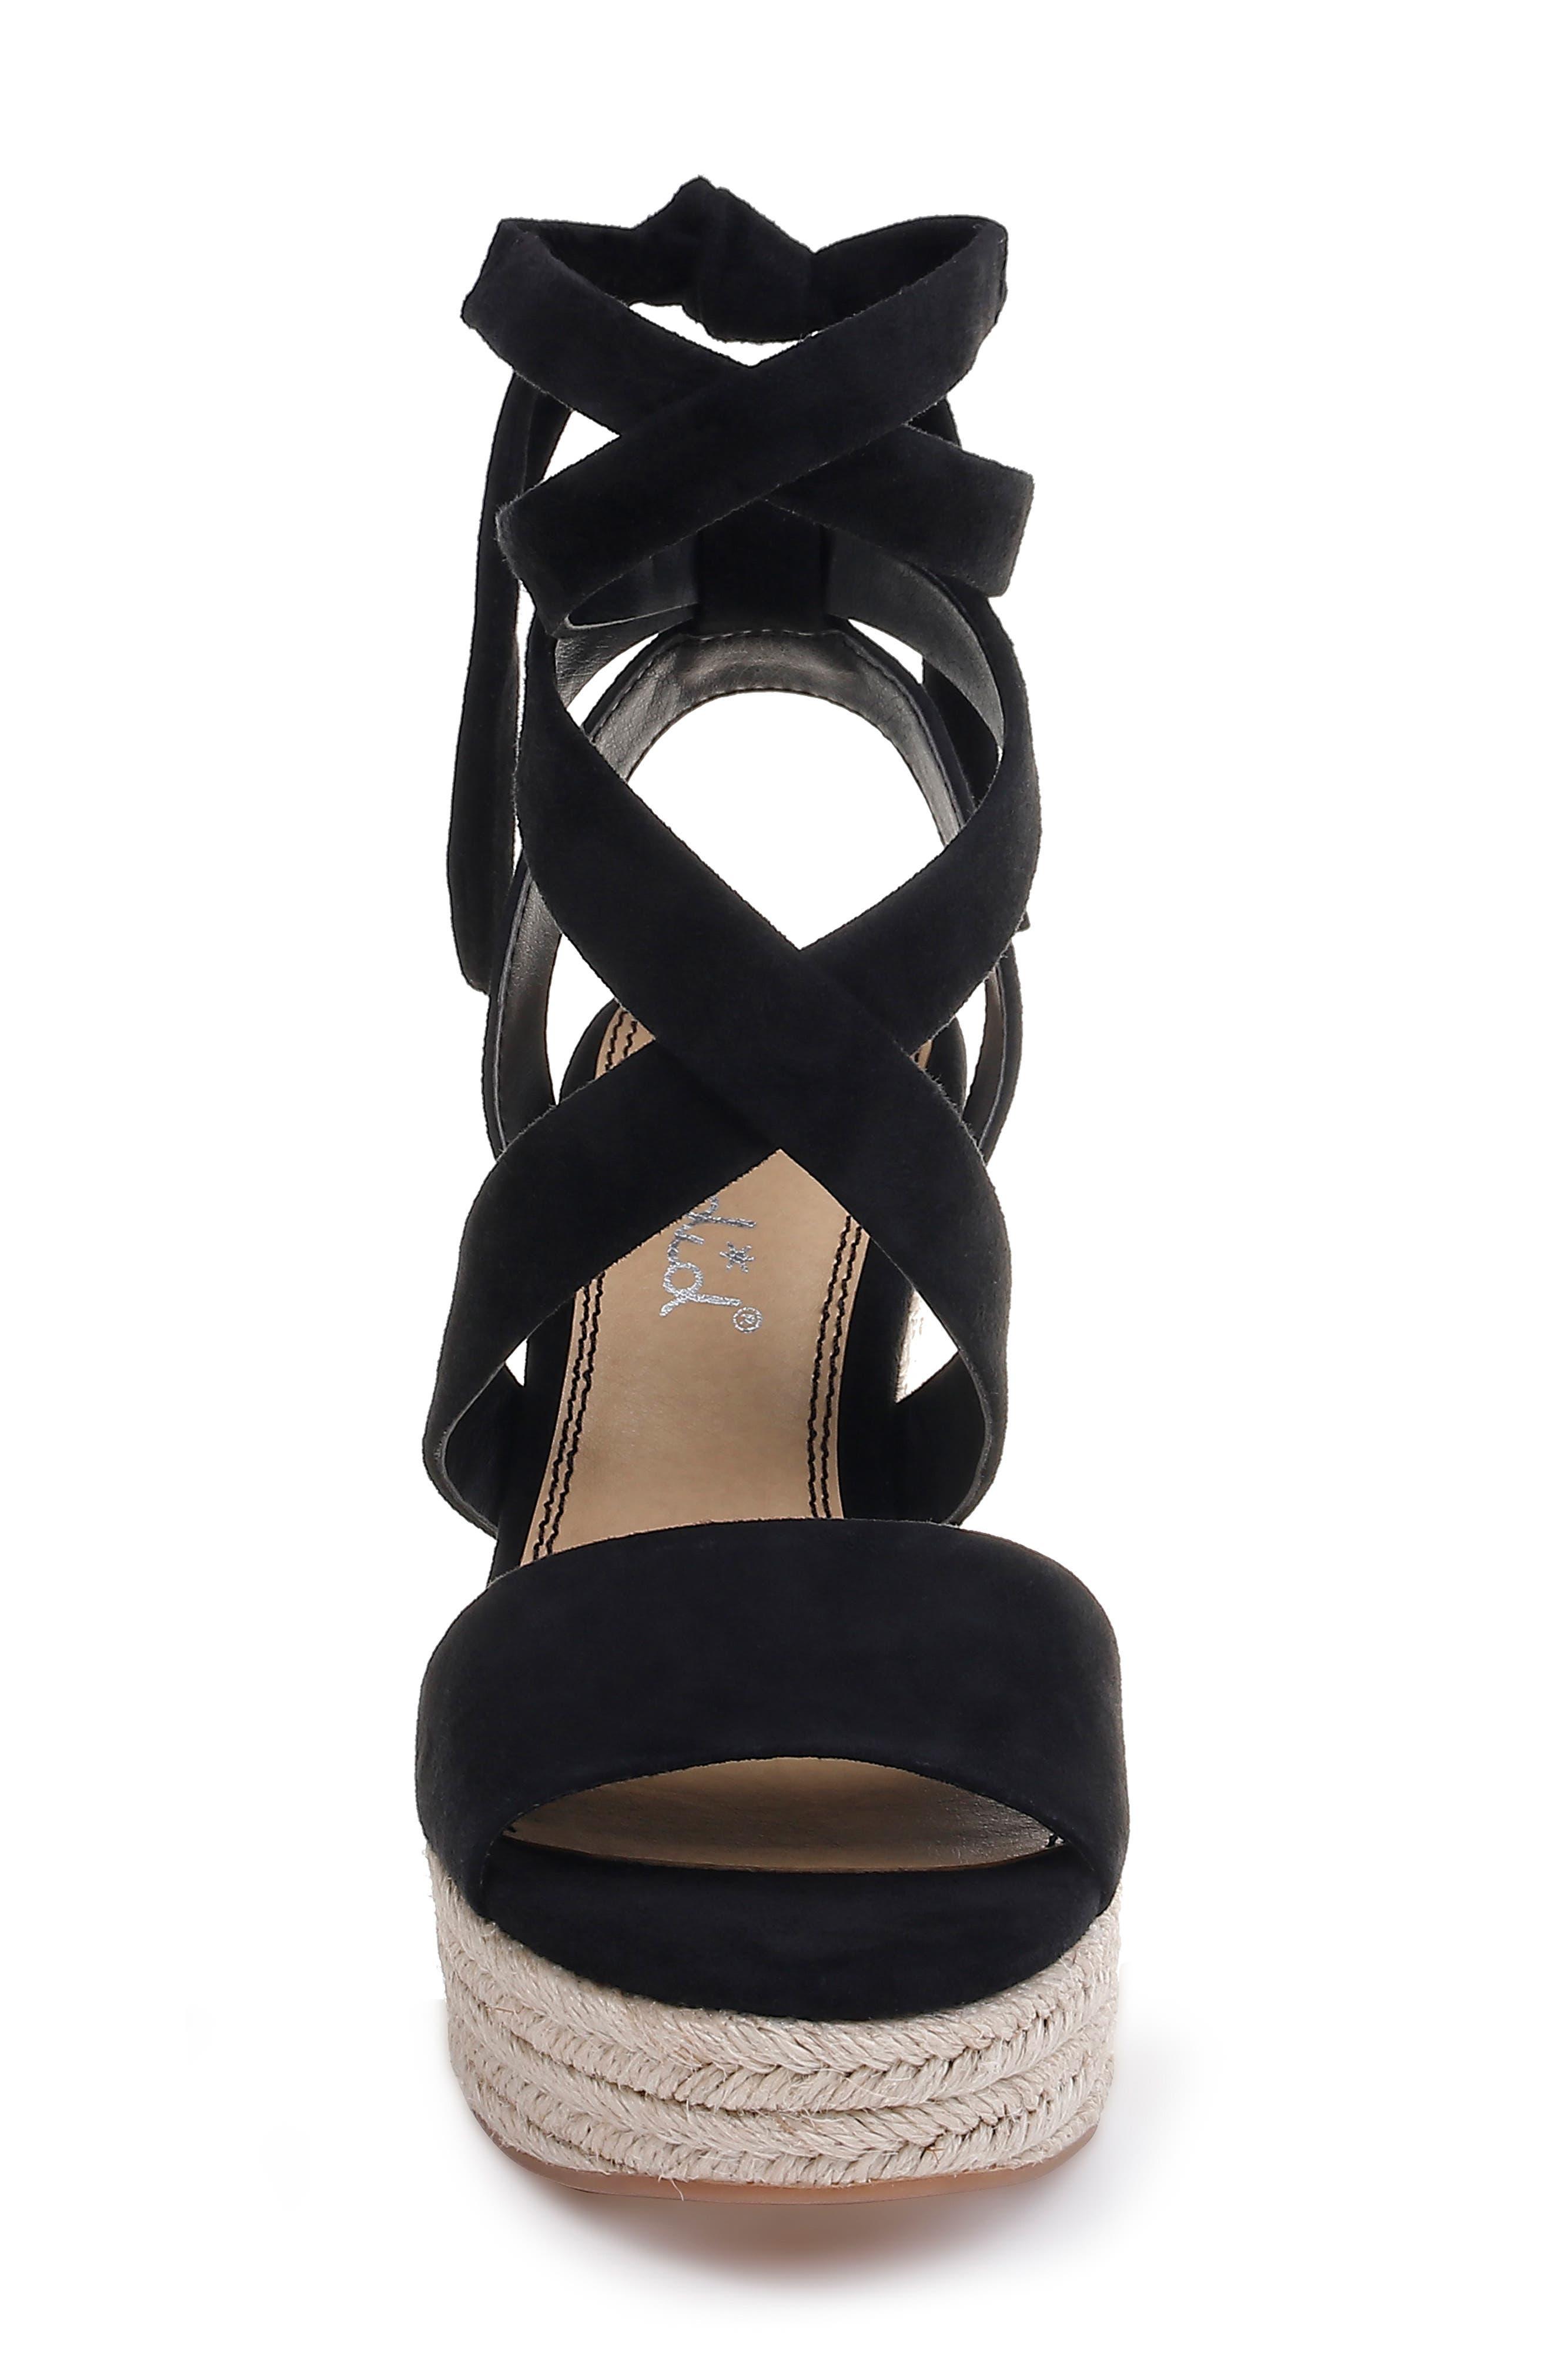 SPLENDID, Tessie Ankle Wrap Wedge Sandal, Alternate thumbnail 4, color, BLACK SUEDE